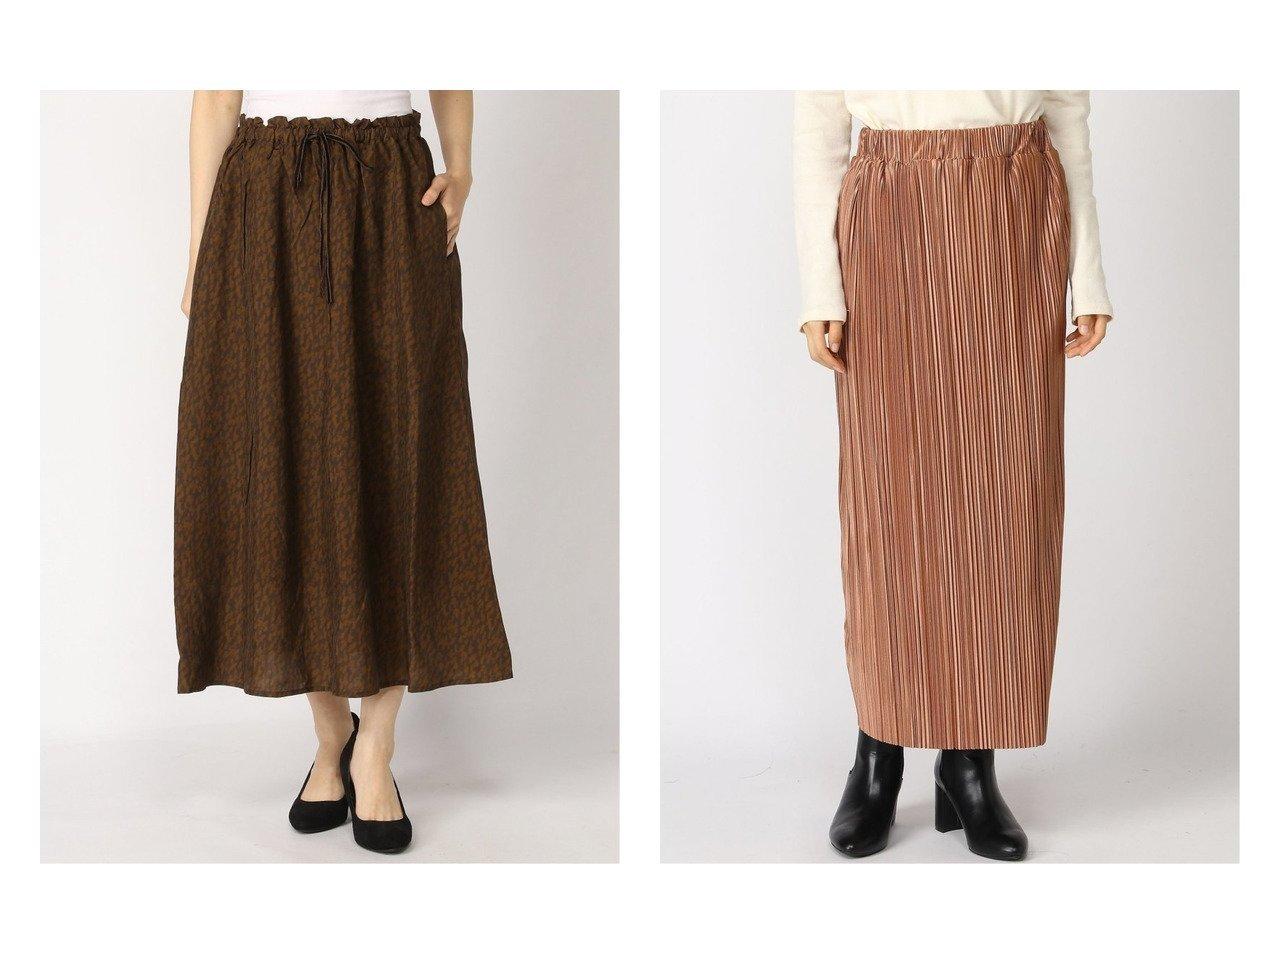 【LOWRYS FARM/ローリーズファーム】のランダムプリーツタイトSK&【studio CLIP/スタディオ クリップ】のNA-キュプラPRTSK スカートのおすすめ!人気、レディースファッションの通販 おすすめで人気のファッション通販商品 インテリア・家具・キッズファッション・メンズファッション・レディースファッション・服の通販 founy(ファニー) https://founy.com/ ファッション Fashion レディース WOMEN スカート Skirt プリーツスカート Pleated Skirts キュプラ ギャザー バランス プリント プリーツ レオパード カットソー ストレート ランダム |ID:crp329100000002711